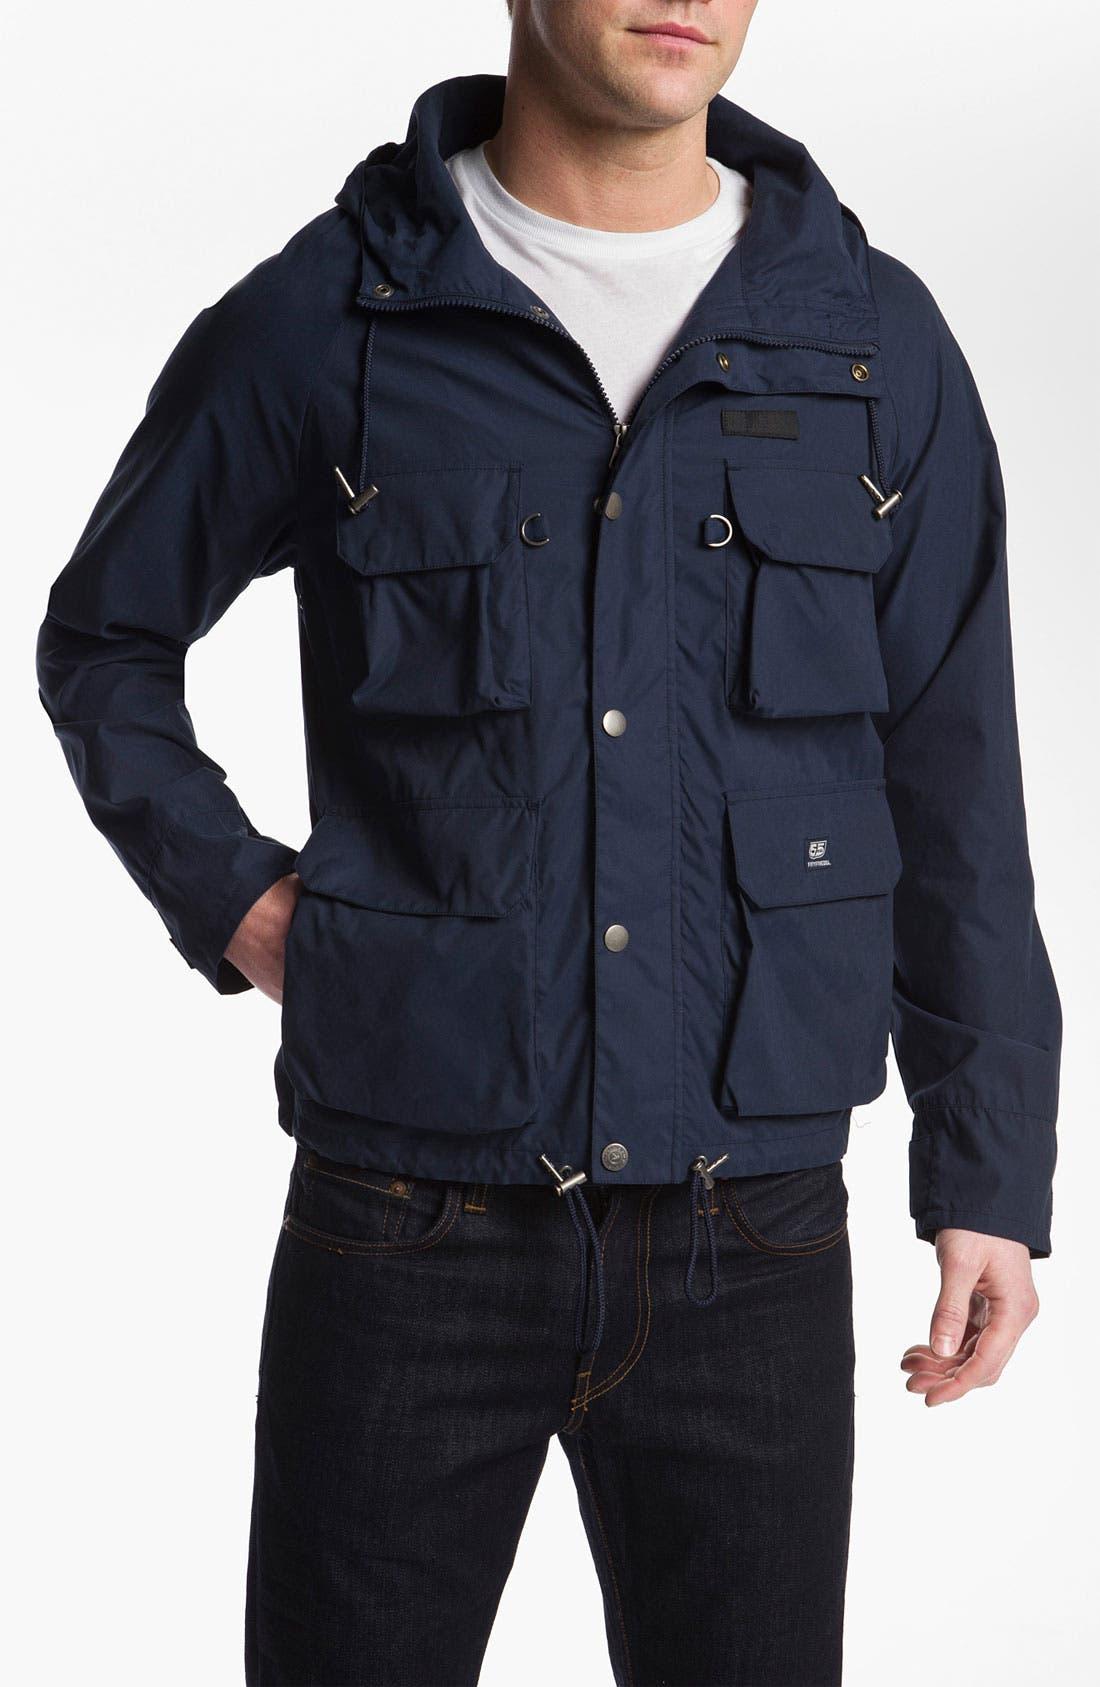 Alternate Image 1 Selected - 55DSL 'Jampei' Twill Jacket